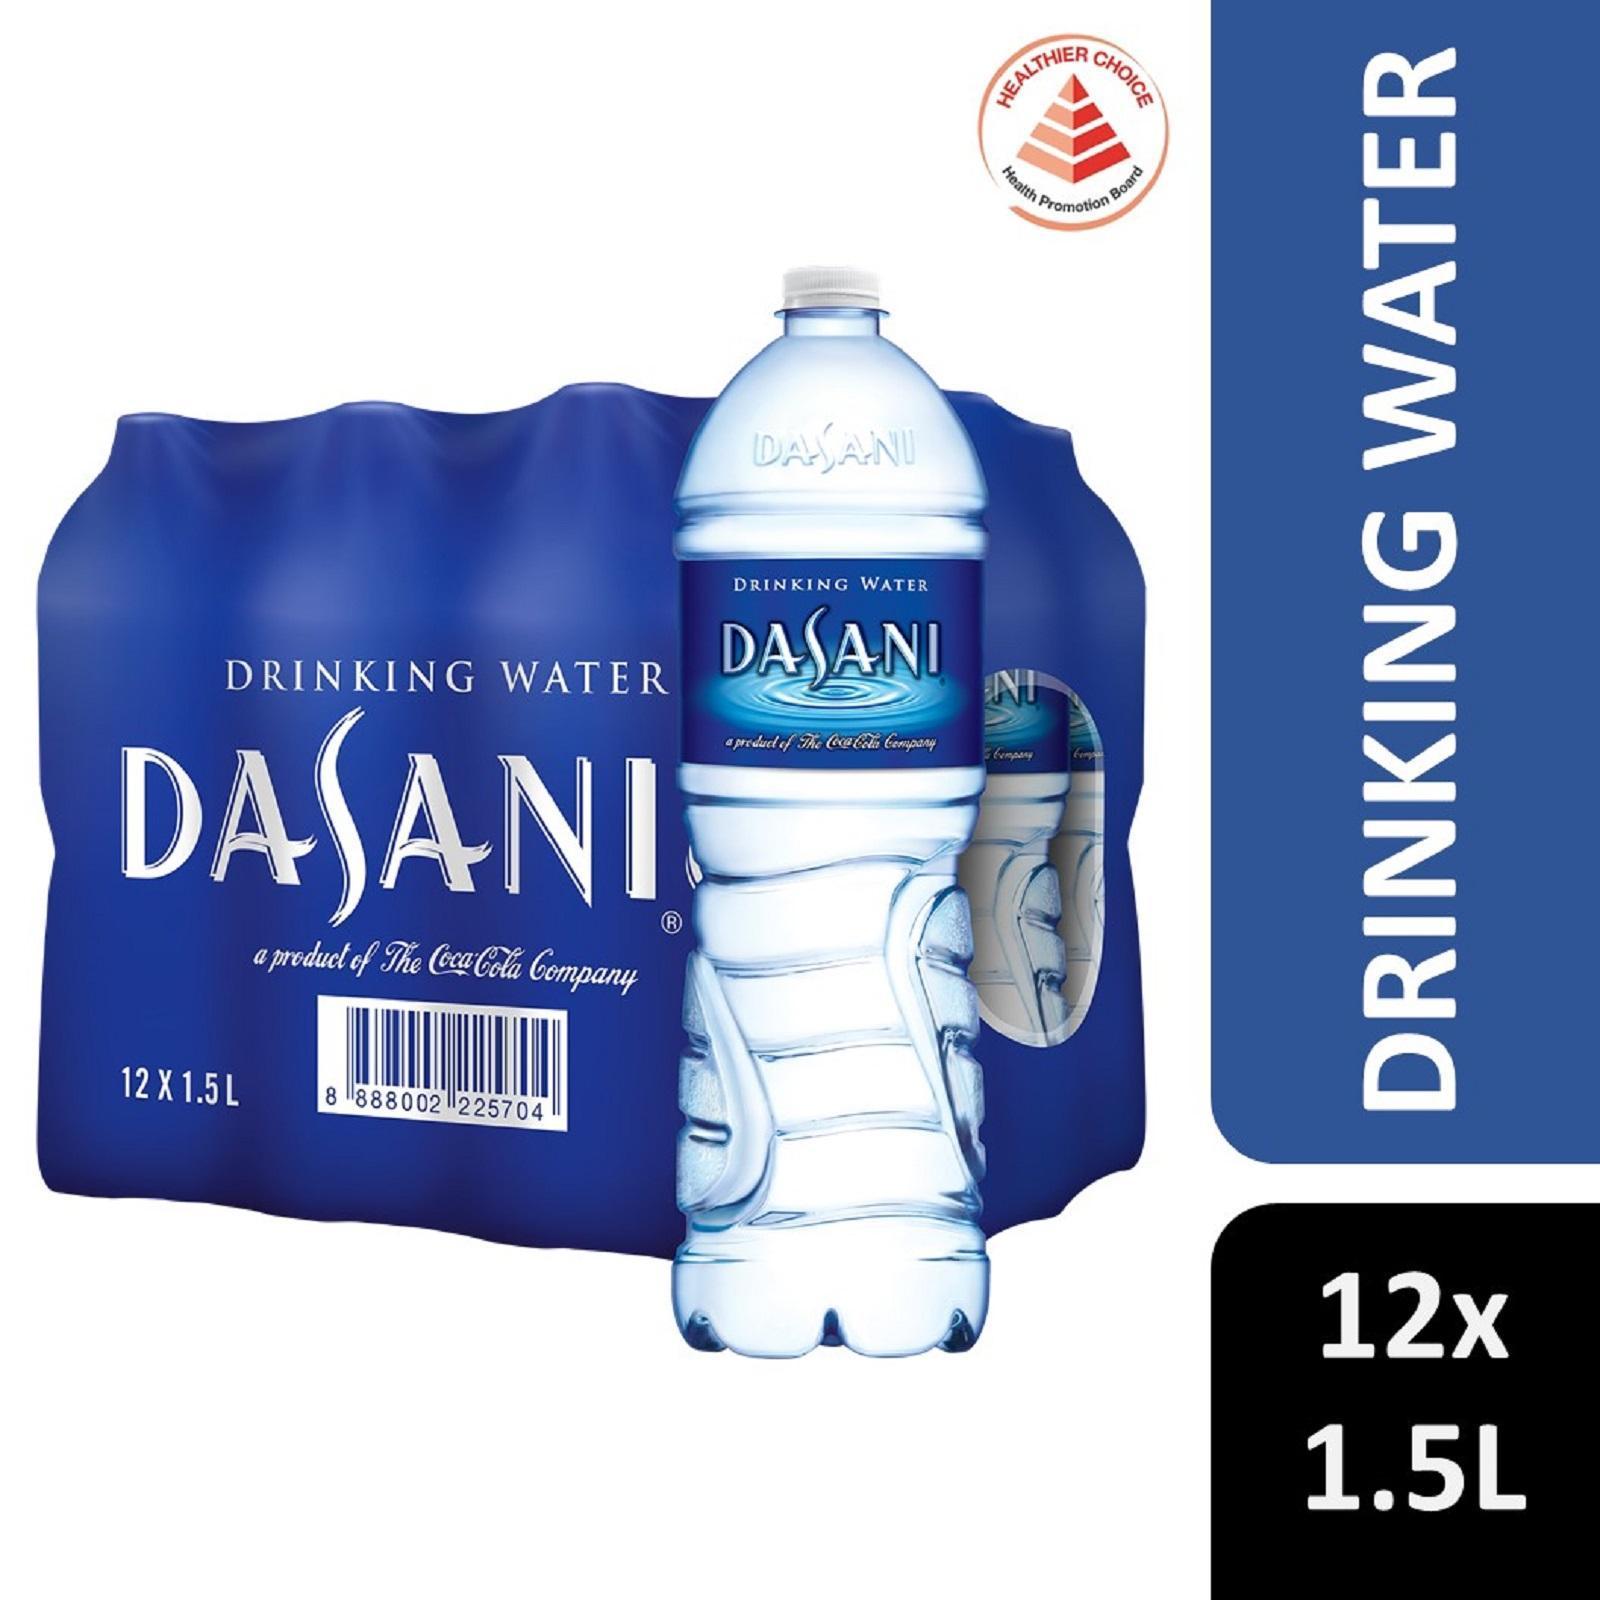 DASANI Drinking Water 24sX600ml